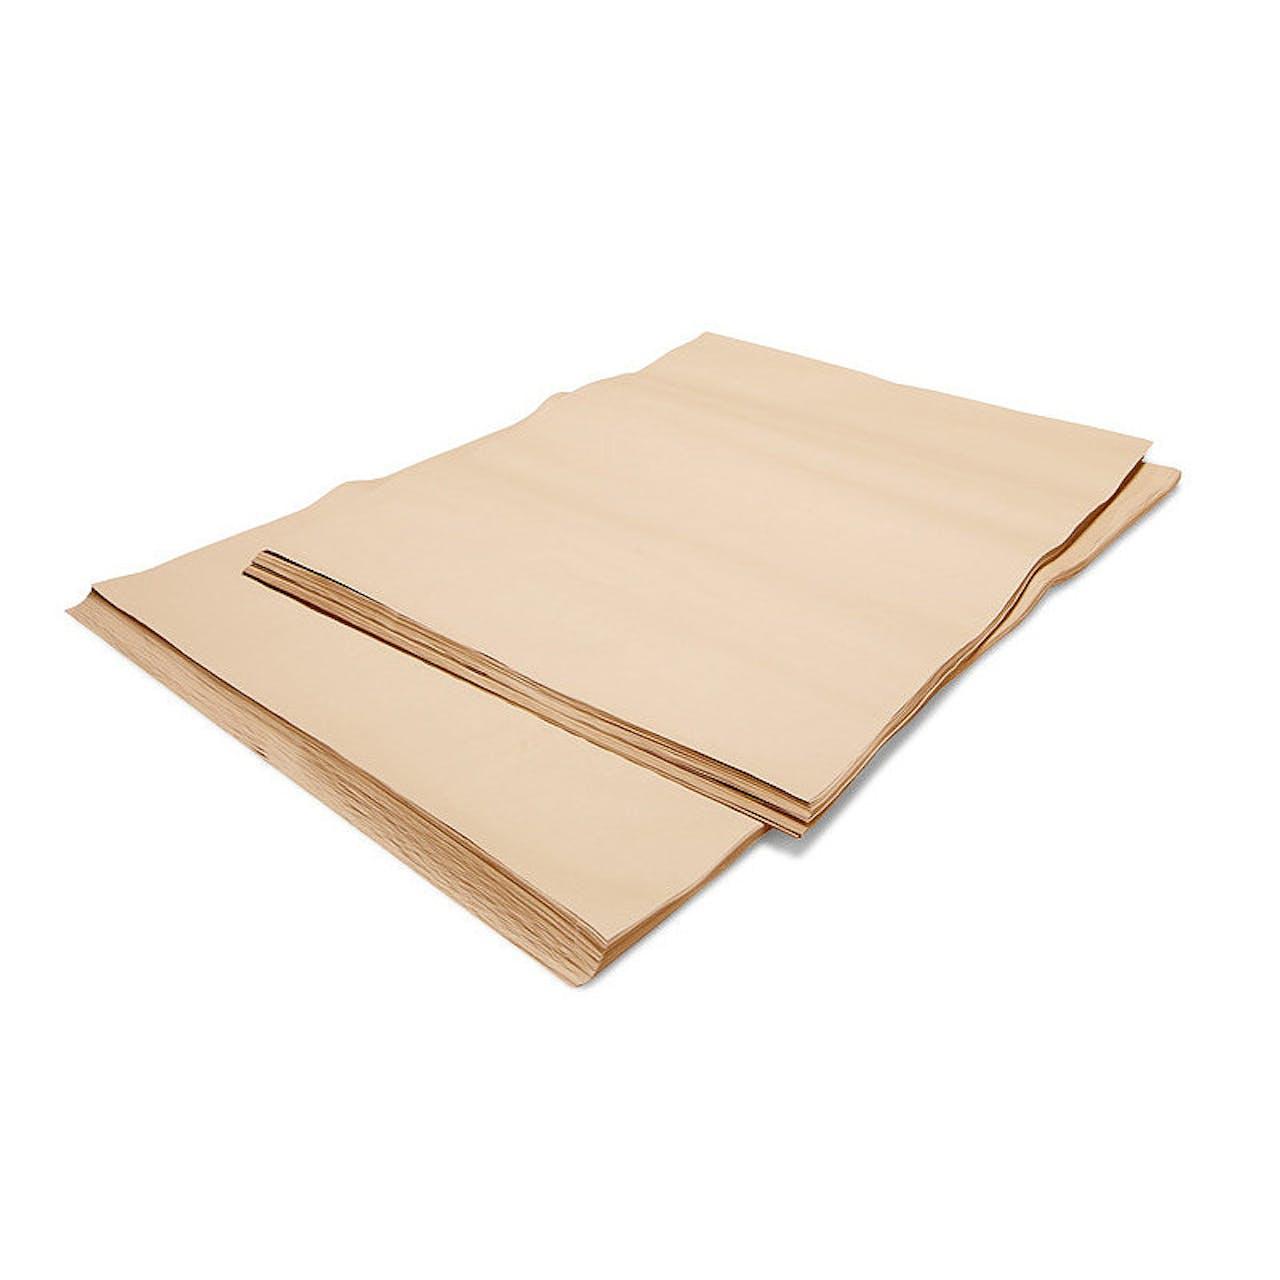 Packpapier im Bogen